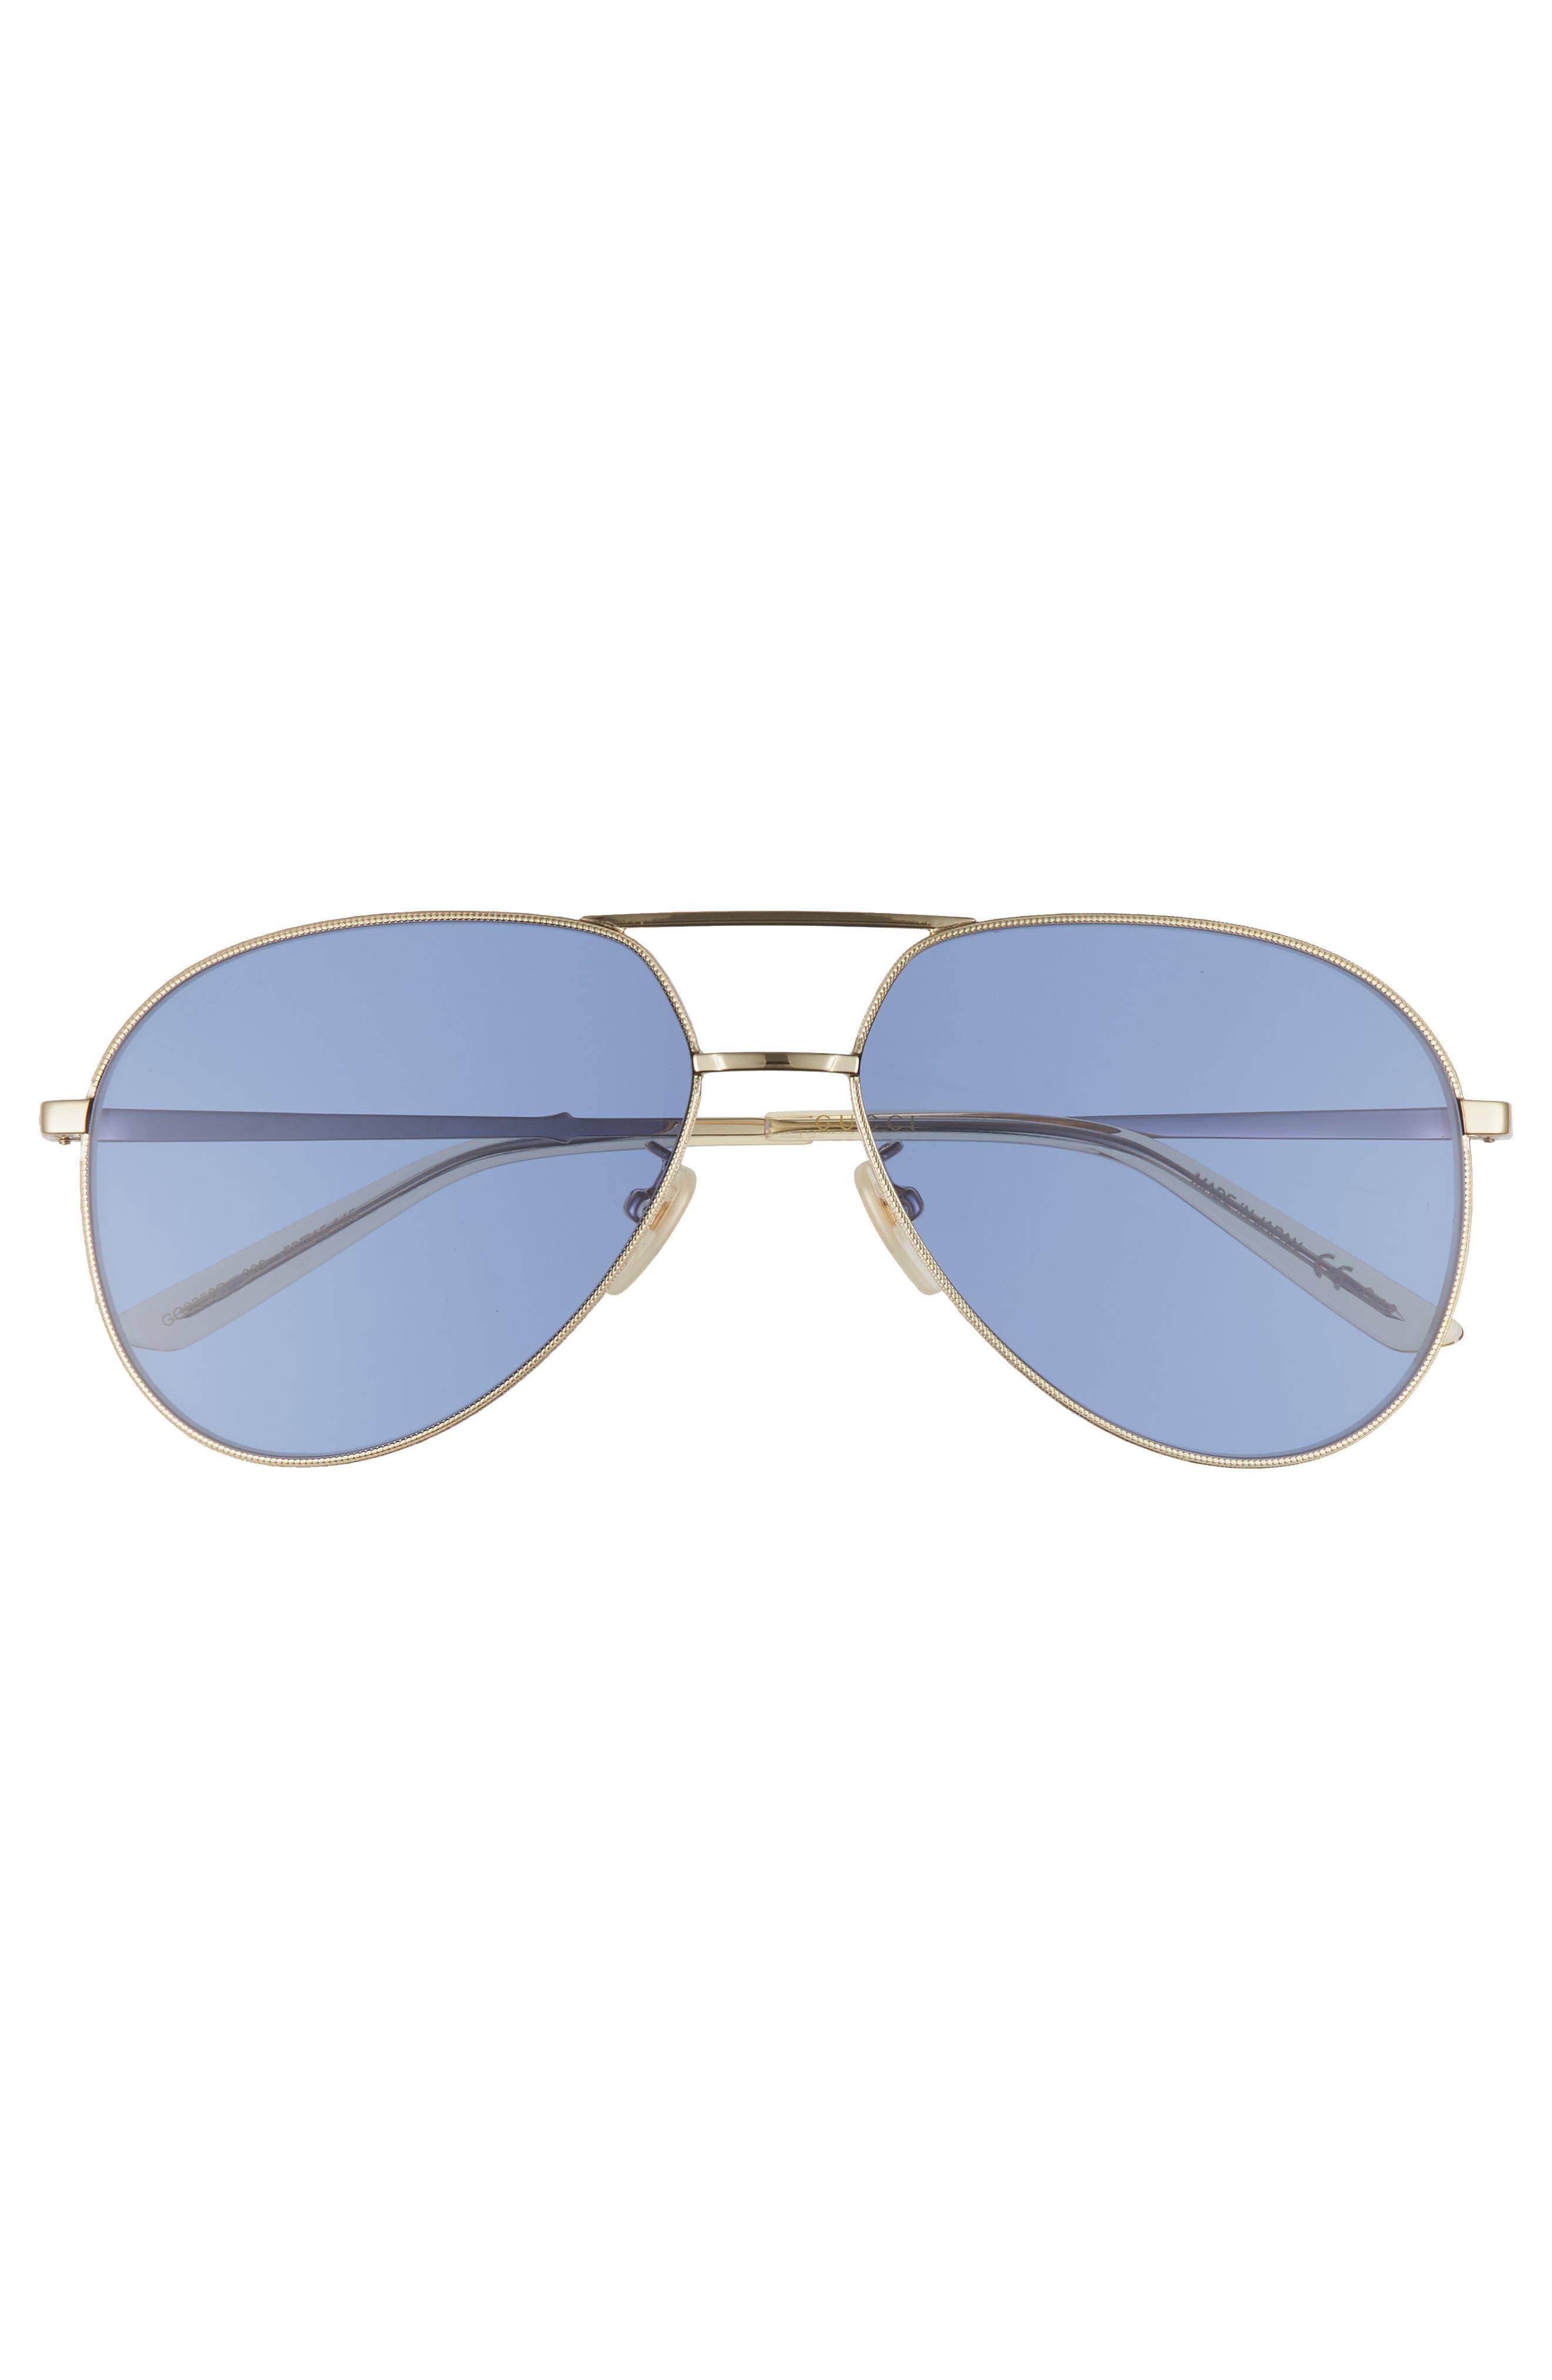 59mm Aviator Sunglasses,                             Alternate thumbnail 2, color,                             GOLD/ YELLOW